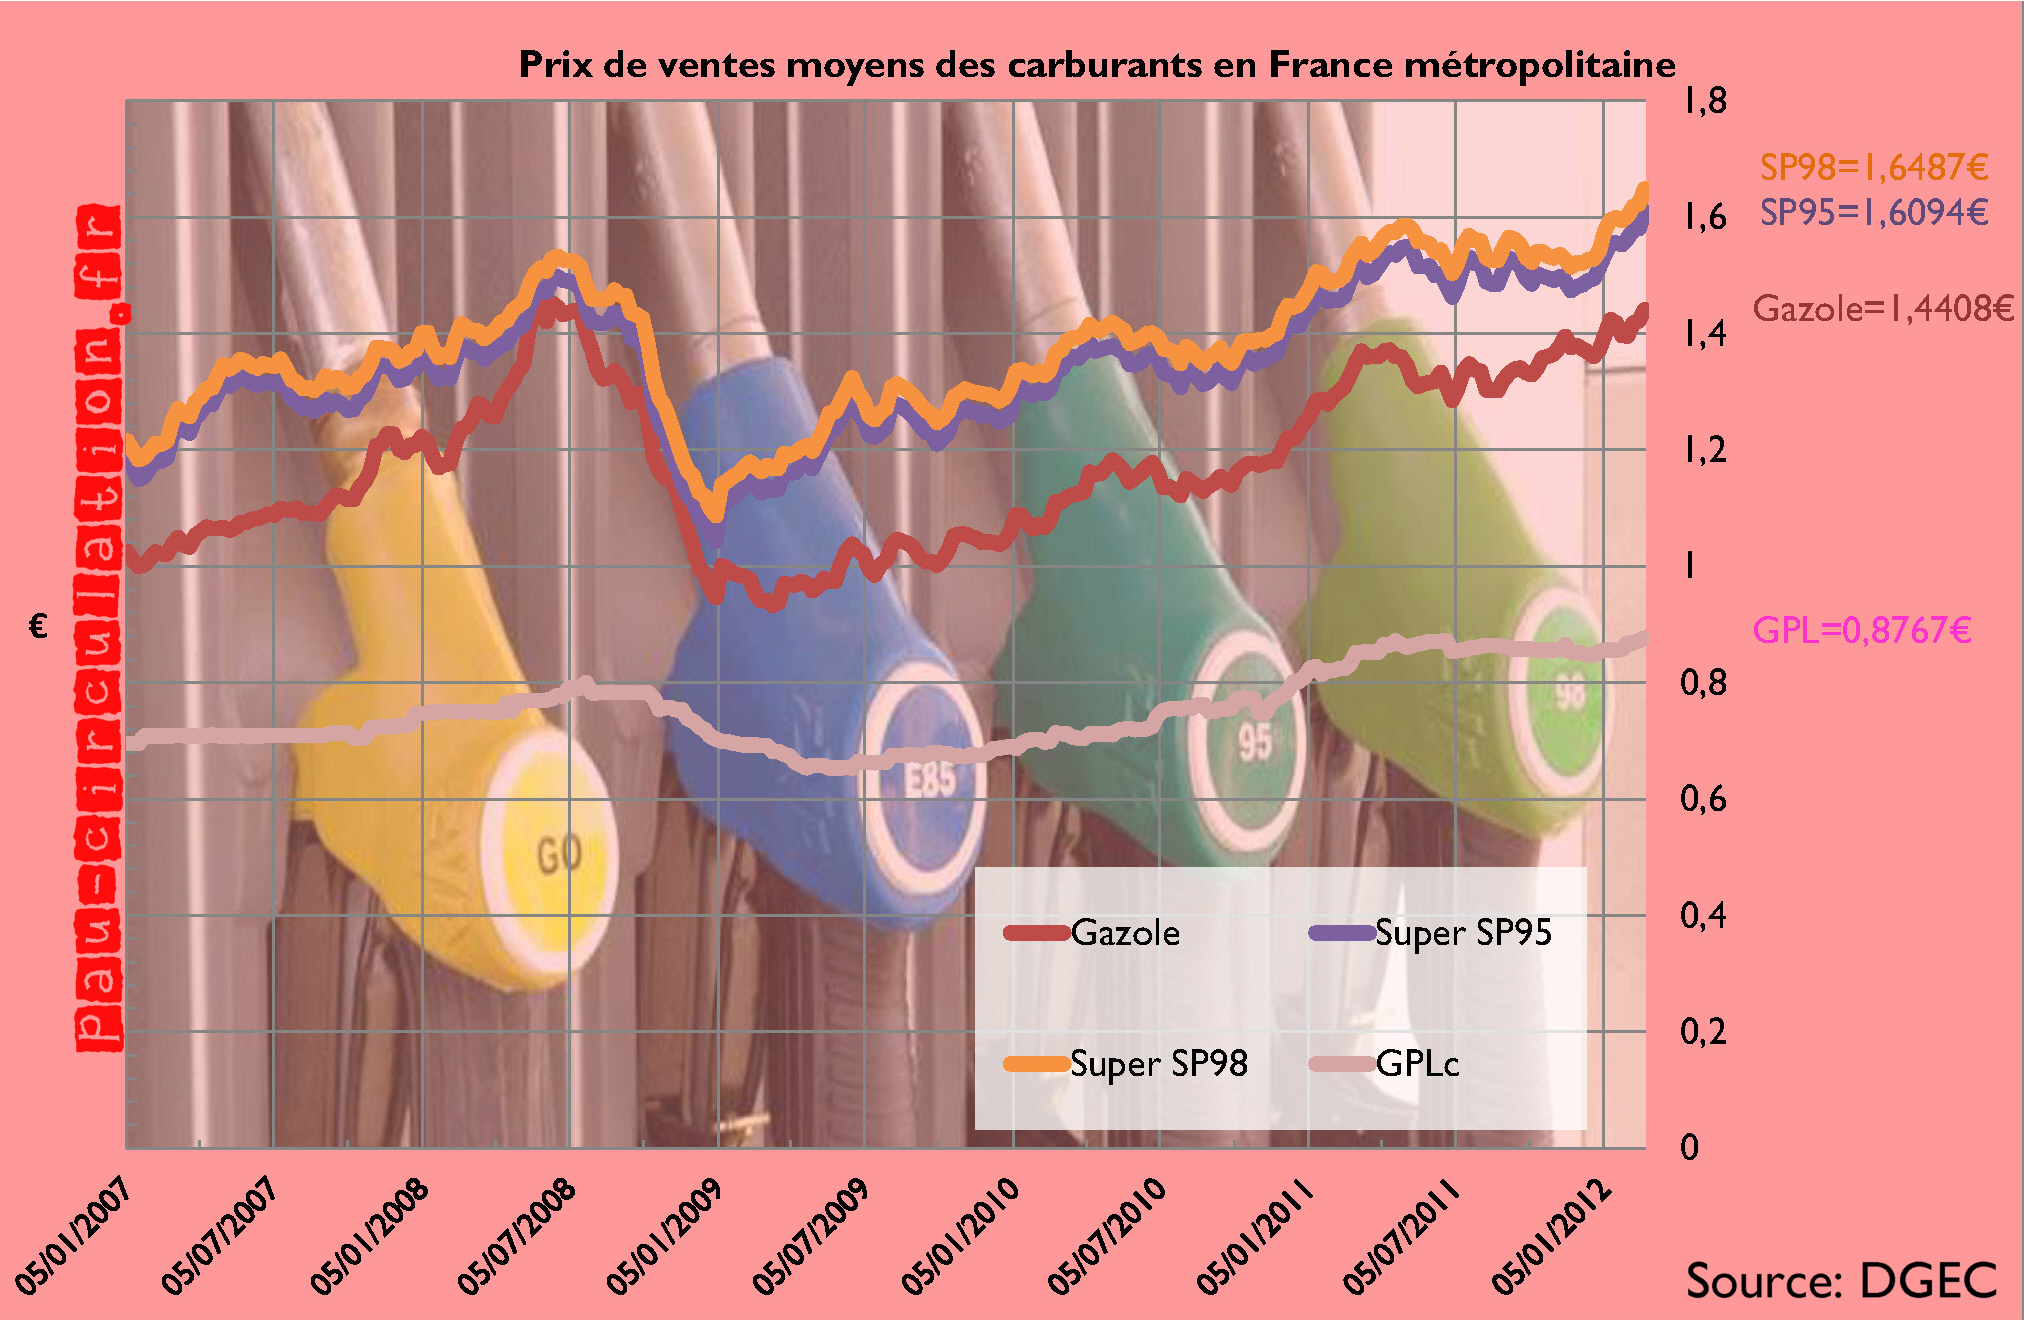 Vertigineuse hausse des prix des carburants